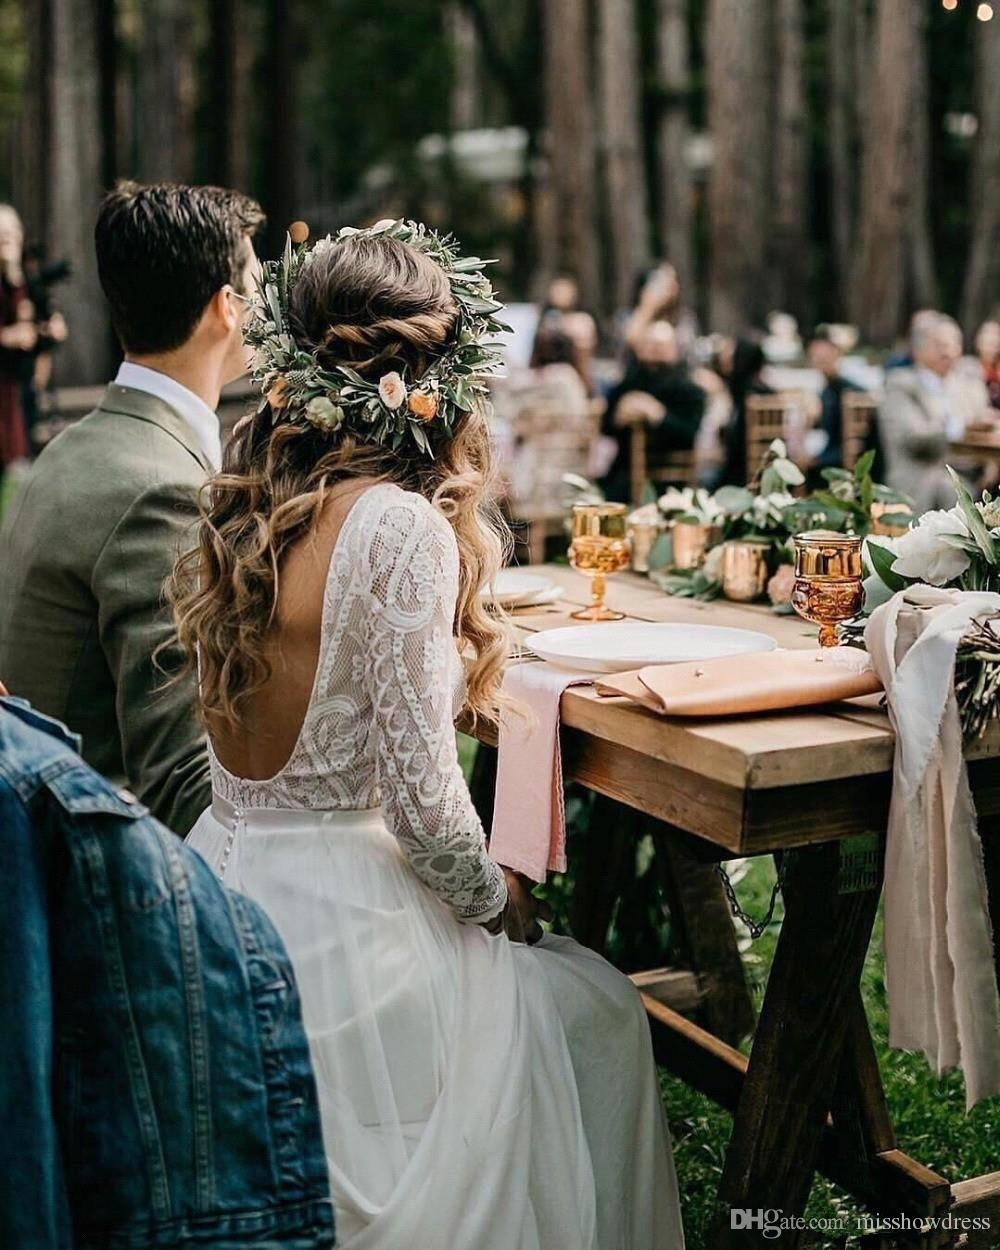 https://www.dhresource.com/0x0s/f2-albu-g8-M01-4B-C7-rBVaV10LXiWAY3g0AARVnCi9yeQ726.jpg/beach-bohemian-wedding-dresses-sexy-backless.jpg